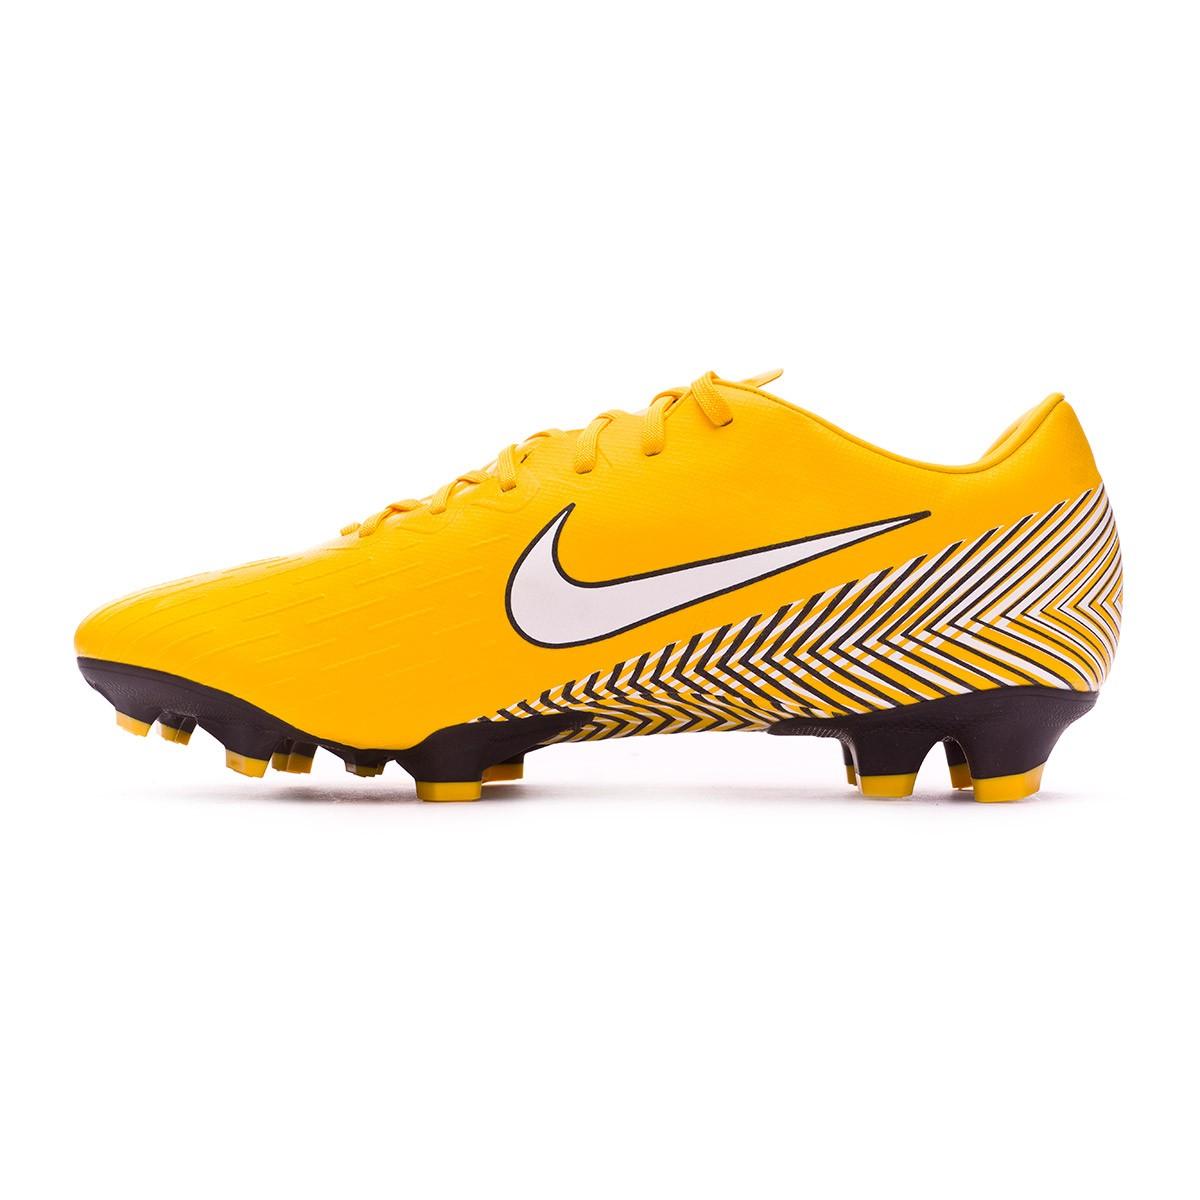 5f4d07c39 Football Boots Nike Mercurial Vapor XII Pro FG Neymar Yellow-Black - Football  store Fútbol Emotion